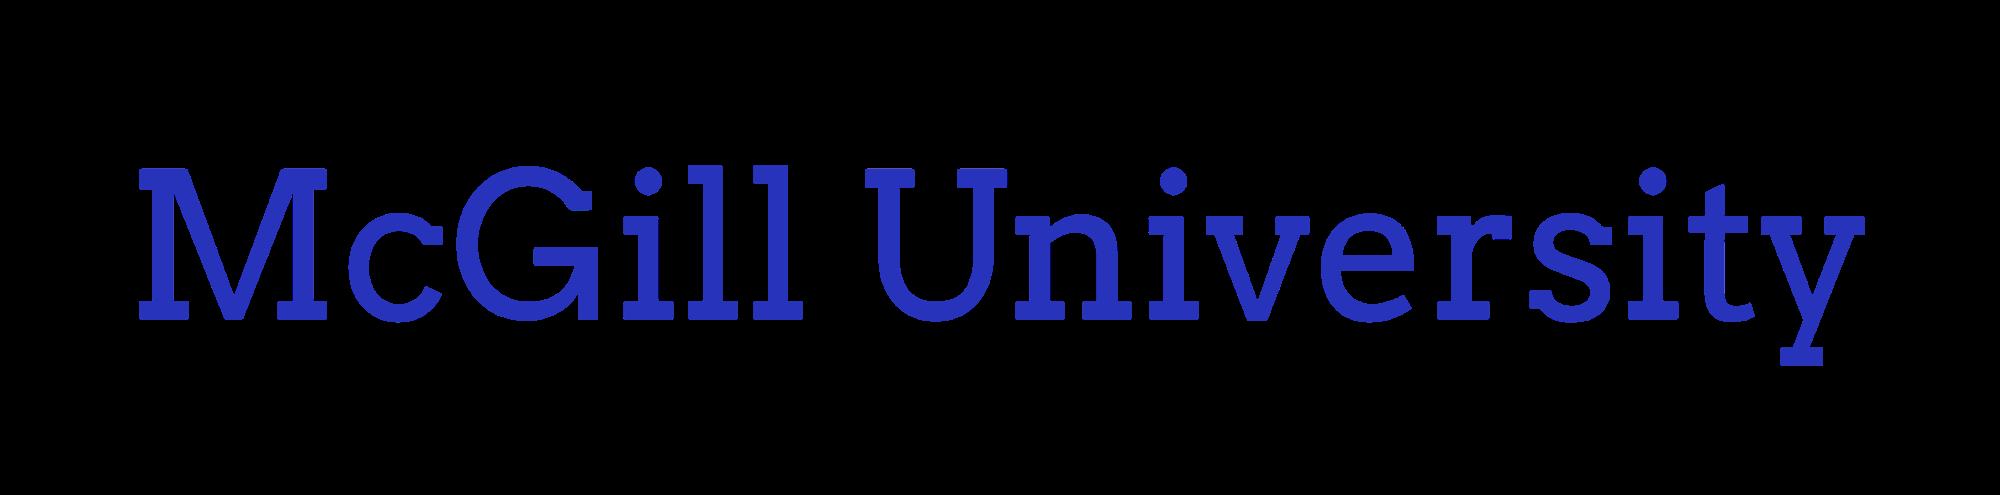 McGill University-logo.png